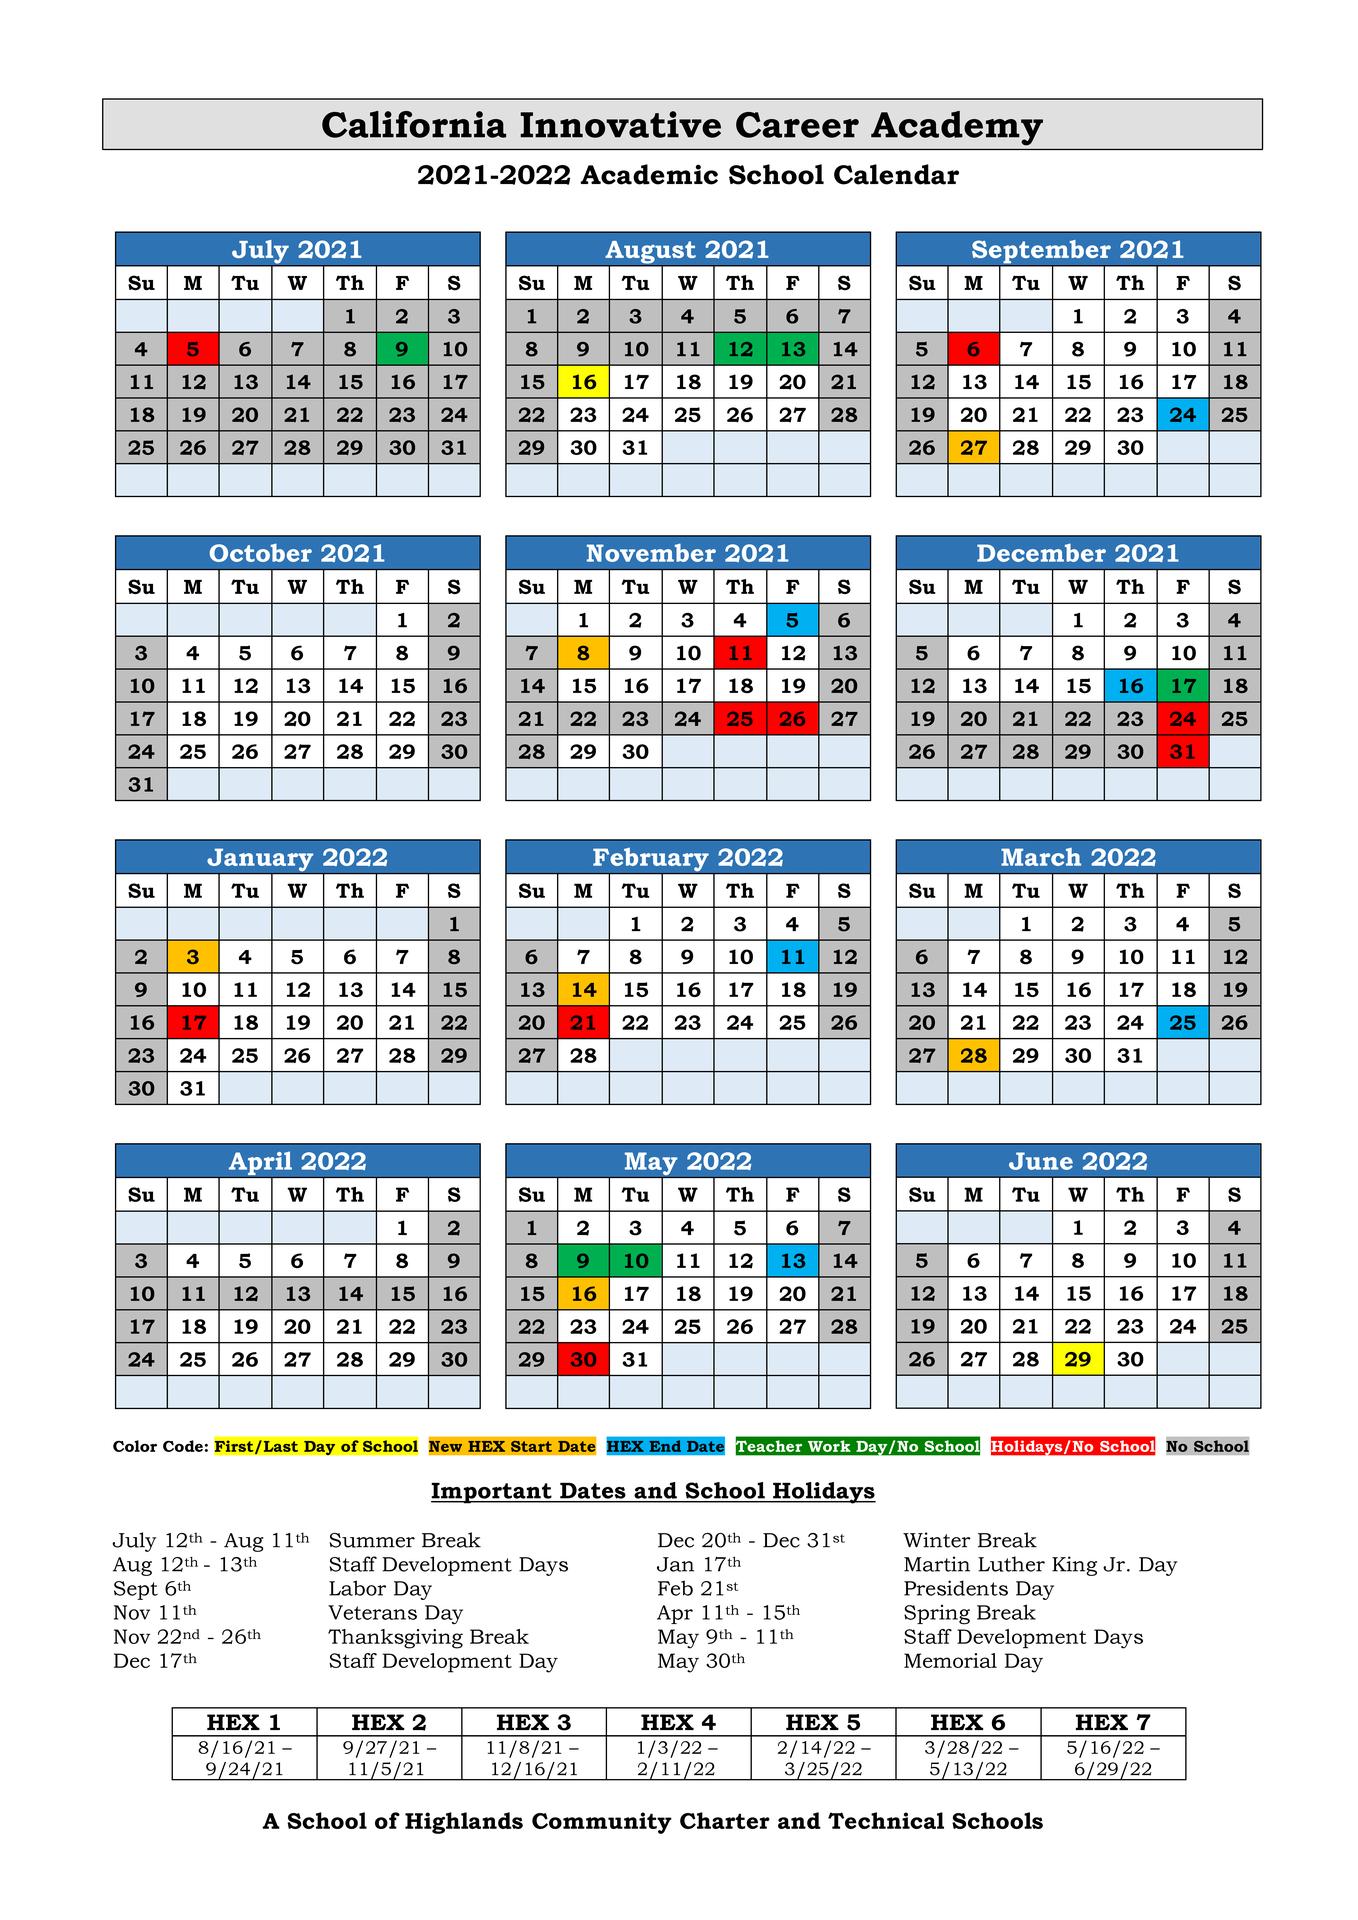 Calendar 21-22